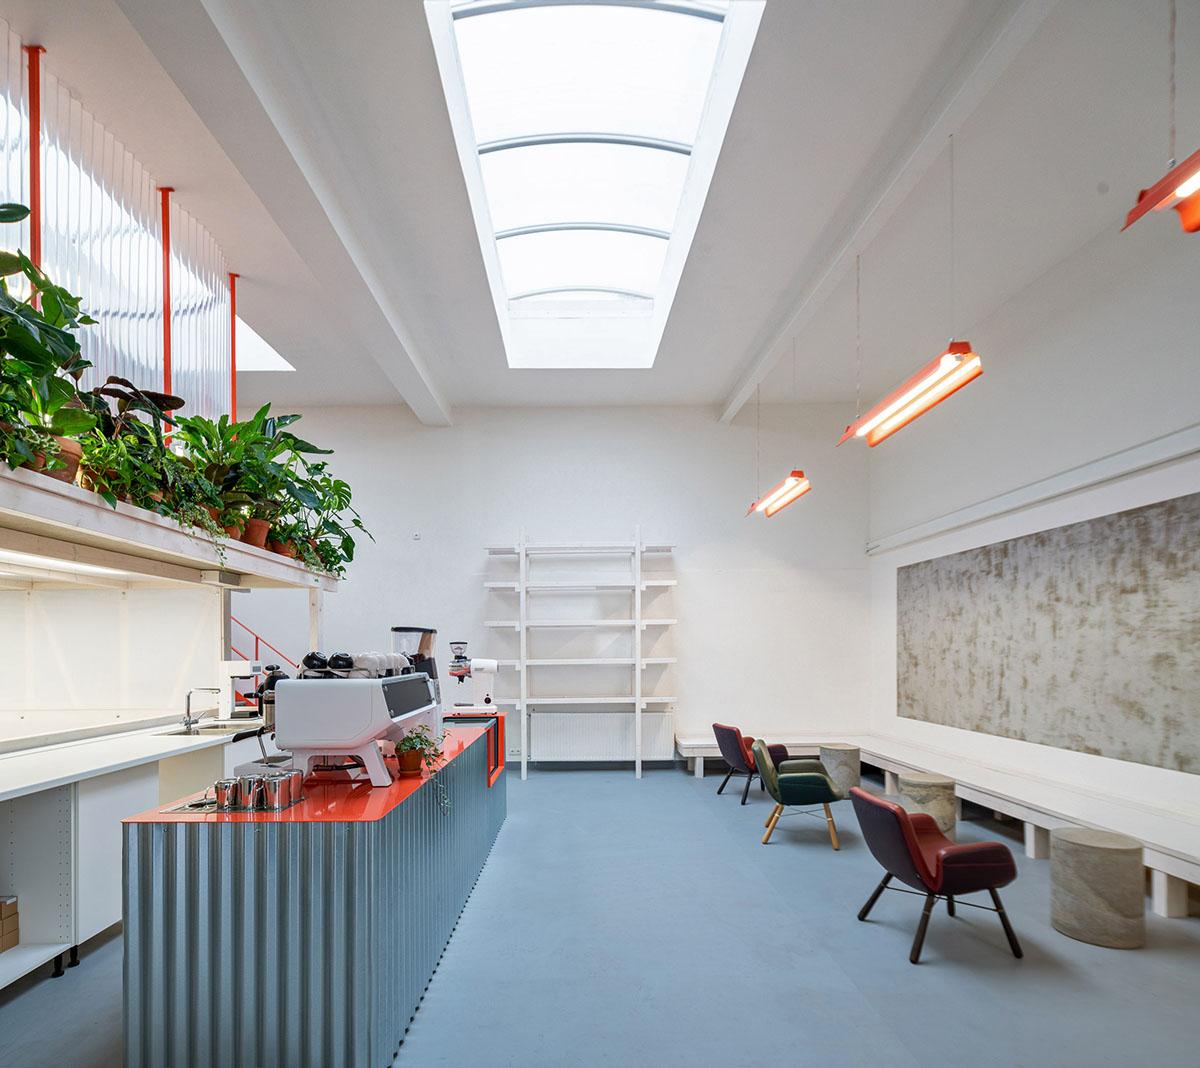 Grounds-Coffee-Hub-Kogaa-Alex-Shoots-Buildings-03